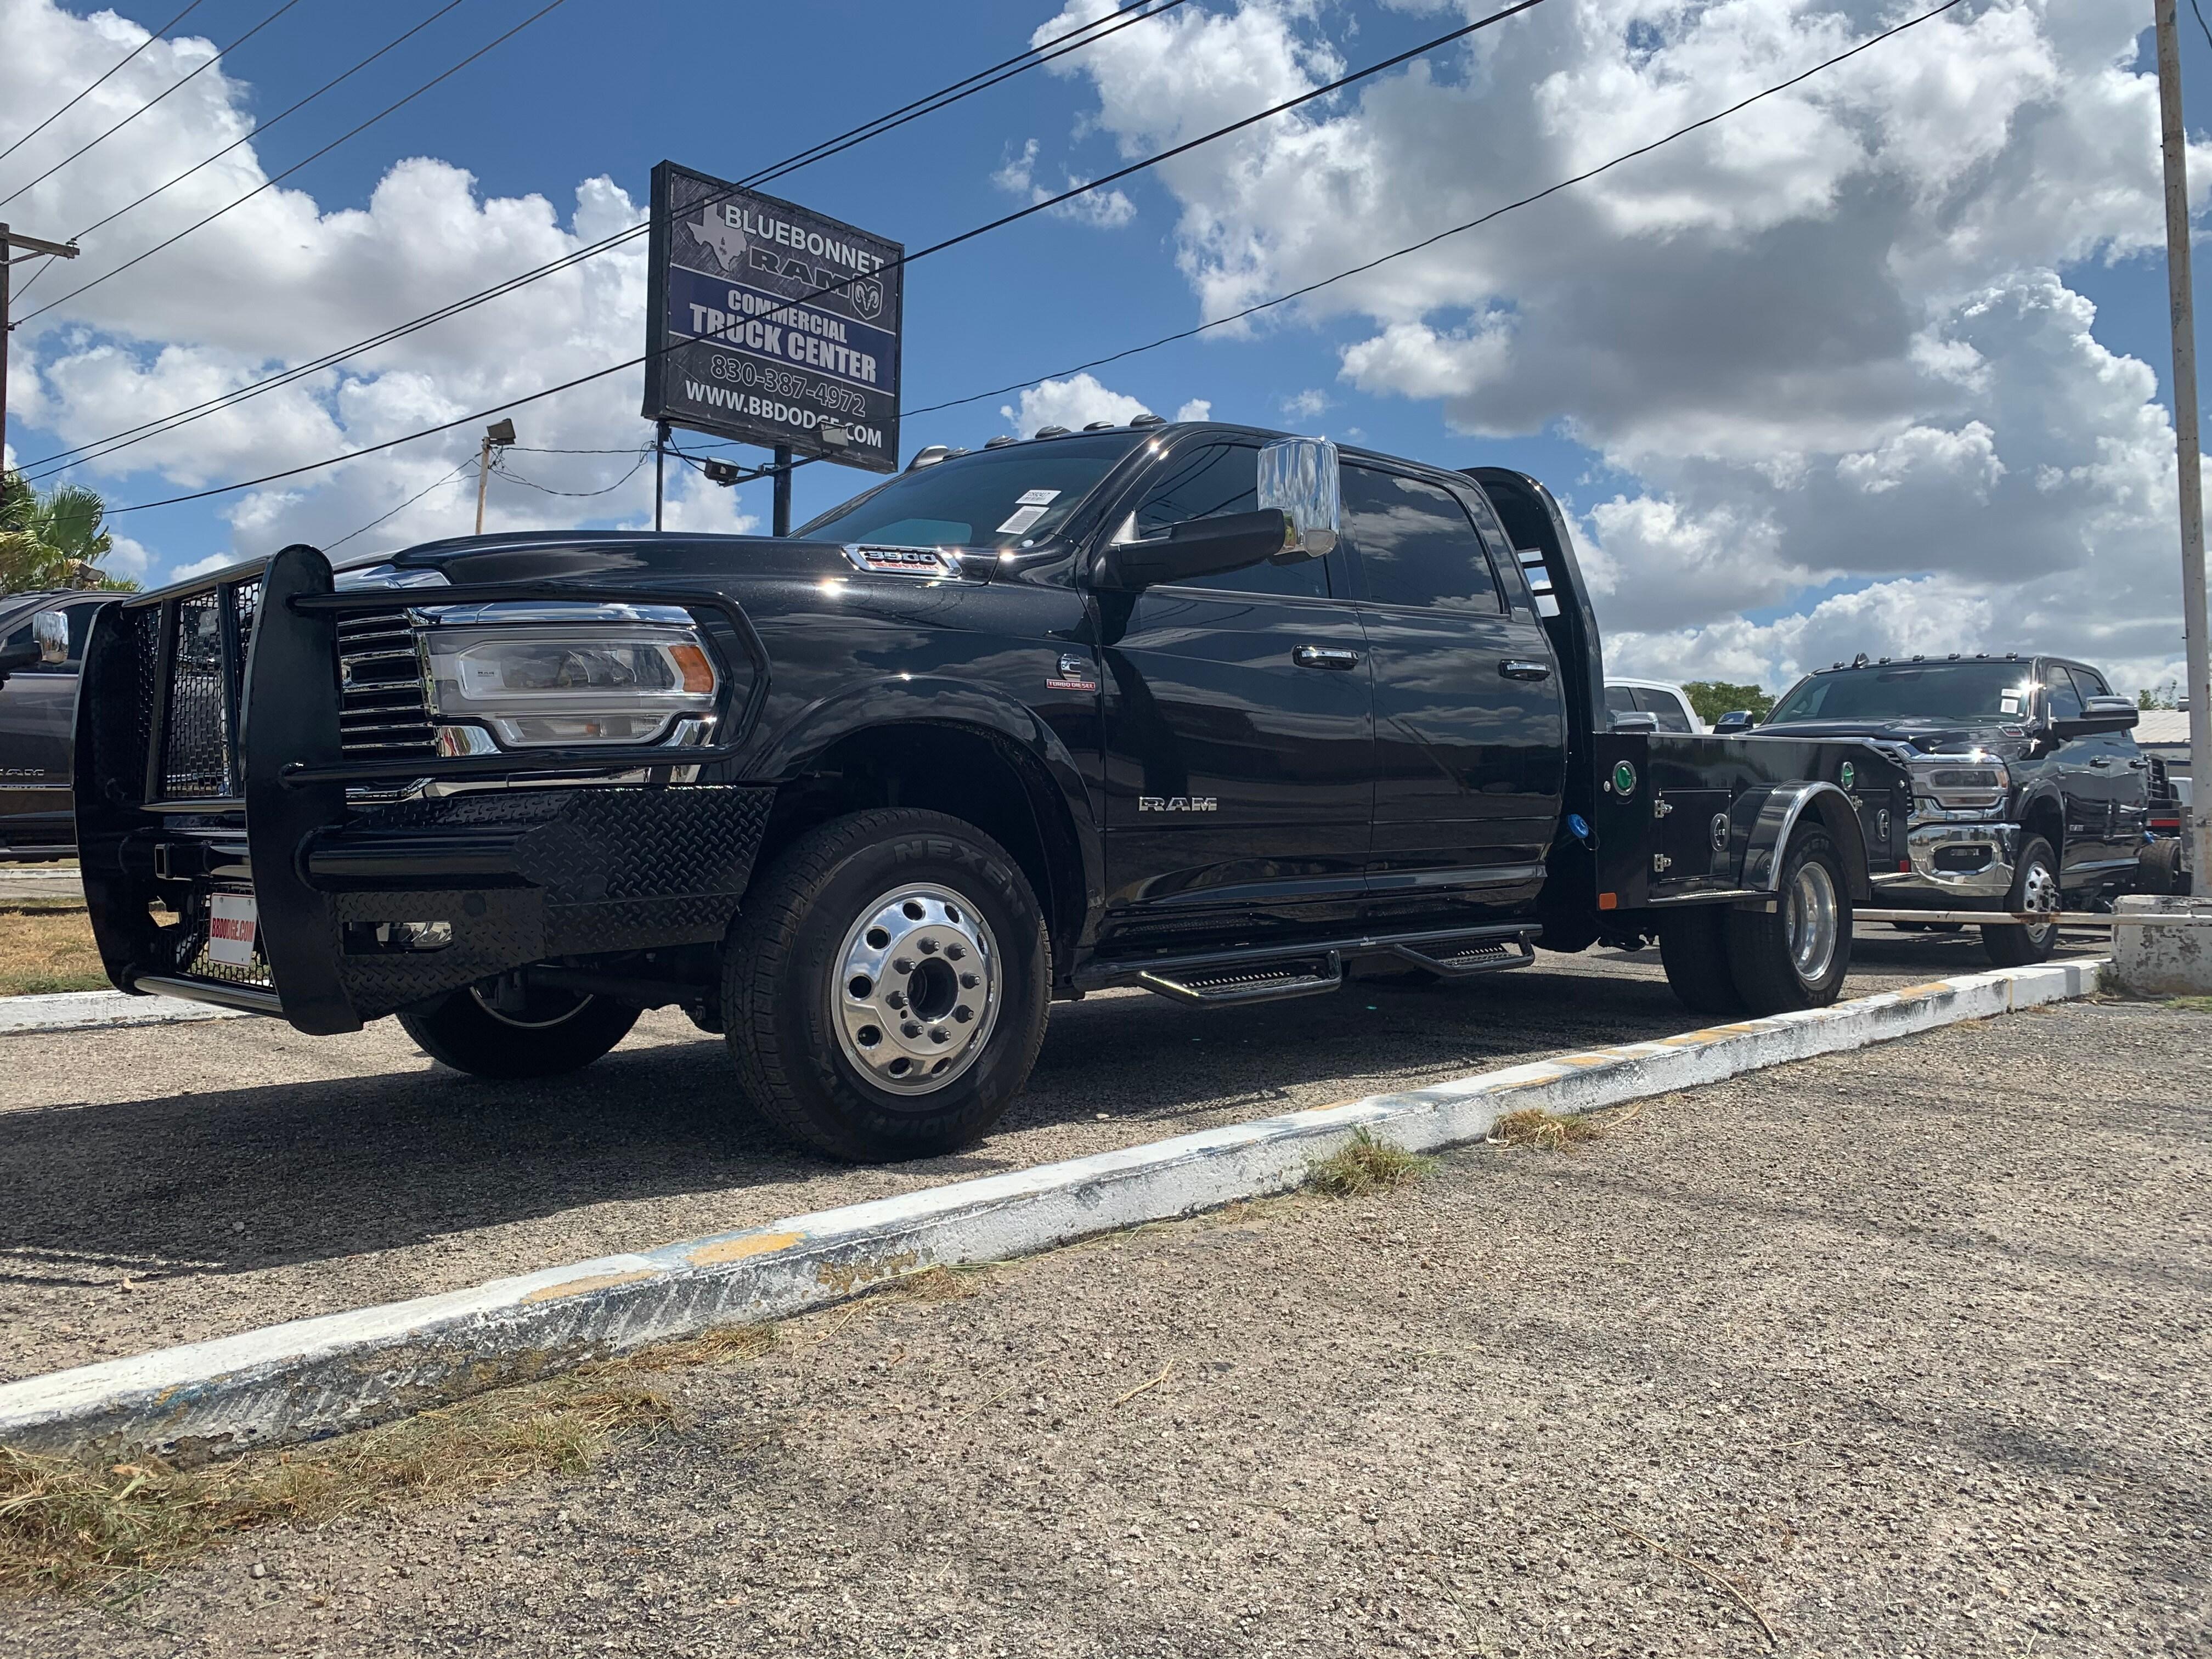 Ram 3500 Truck >> 2019 Ram 3500 Crew Cab Drw 4x4 Cm Truck Beds Er Model Hauler Body Stock Tg592417